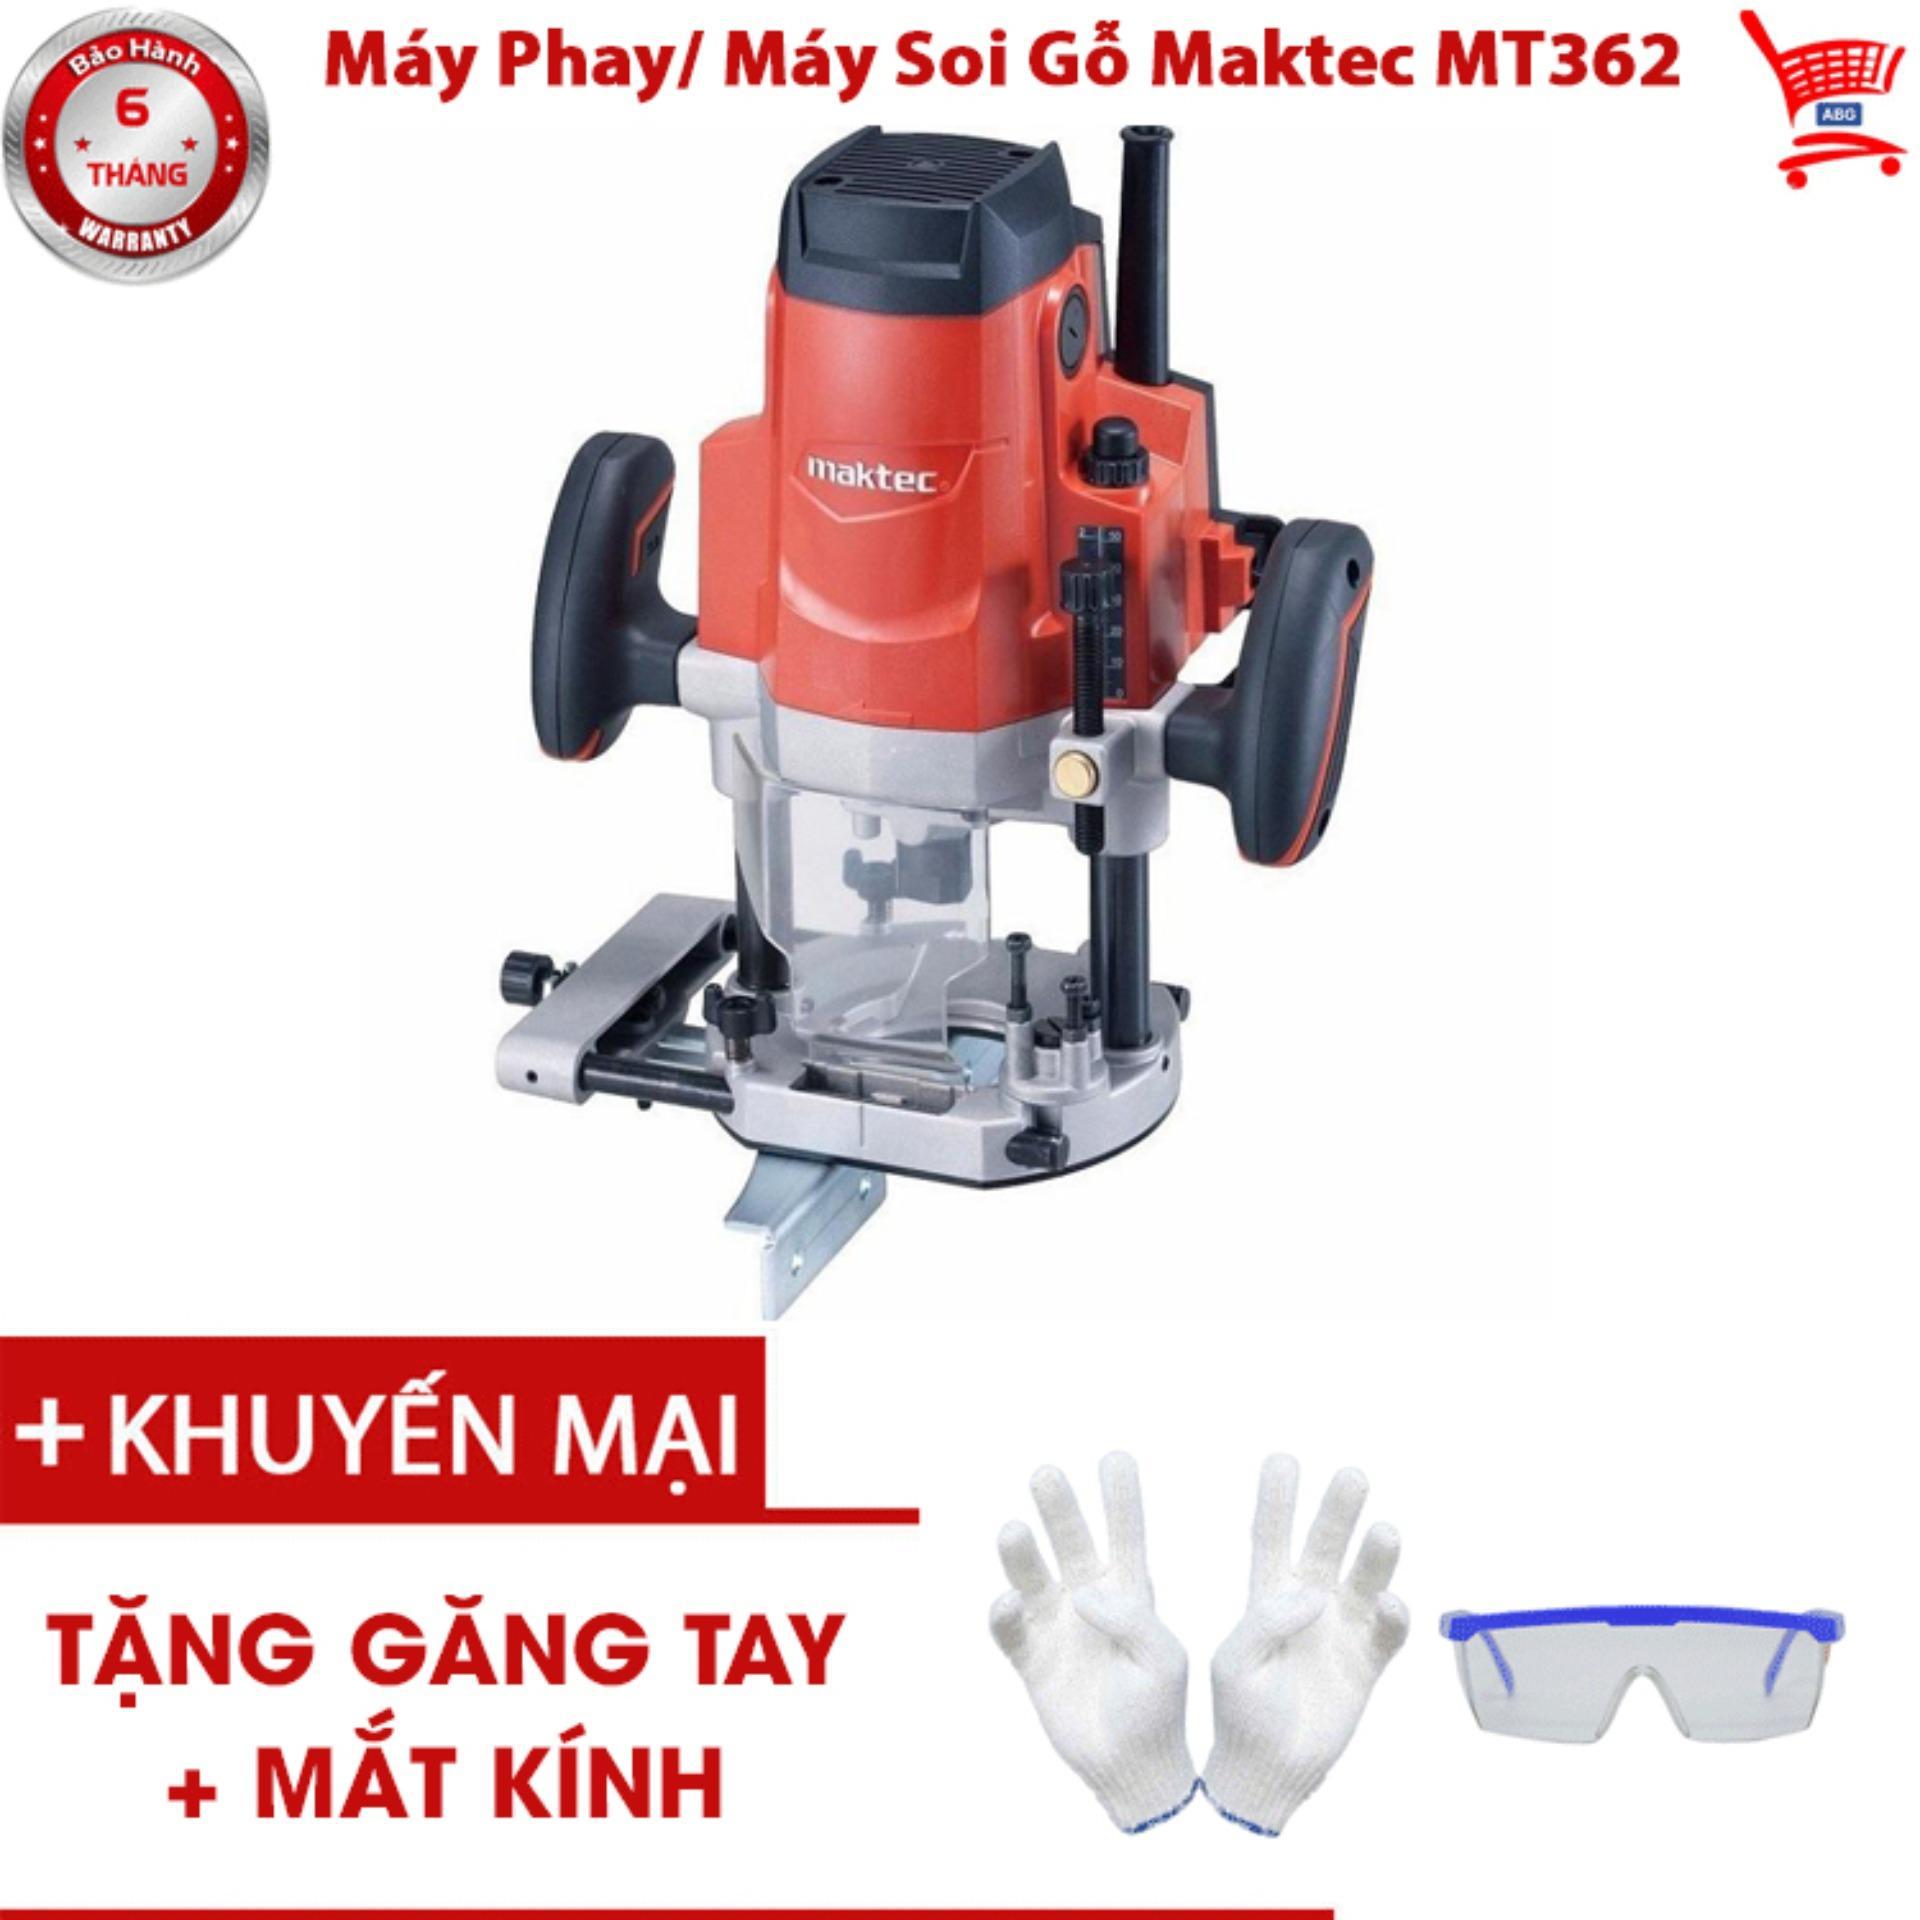 Máy Phay/ Máy Soi Gỗ Maktec MT362 - ABG shop